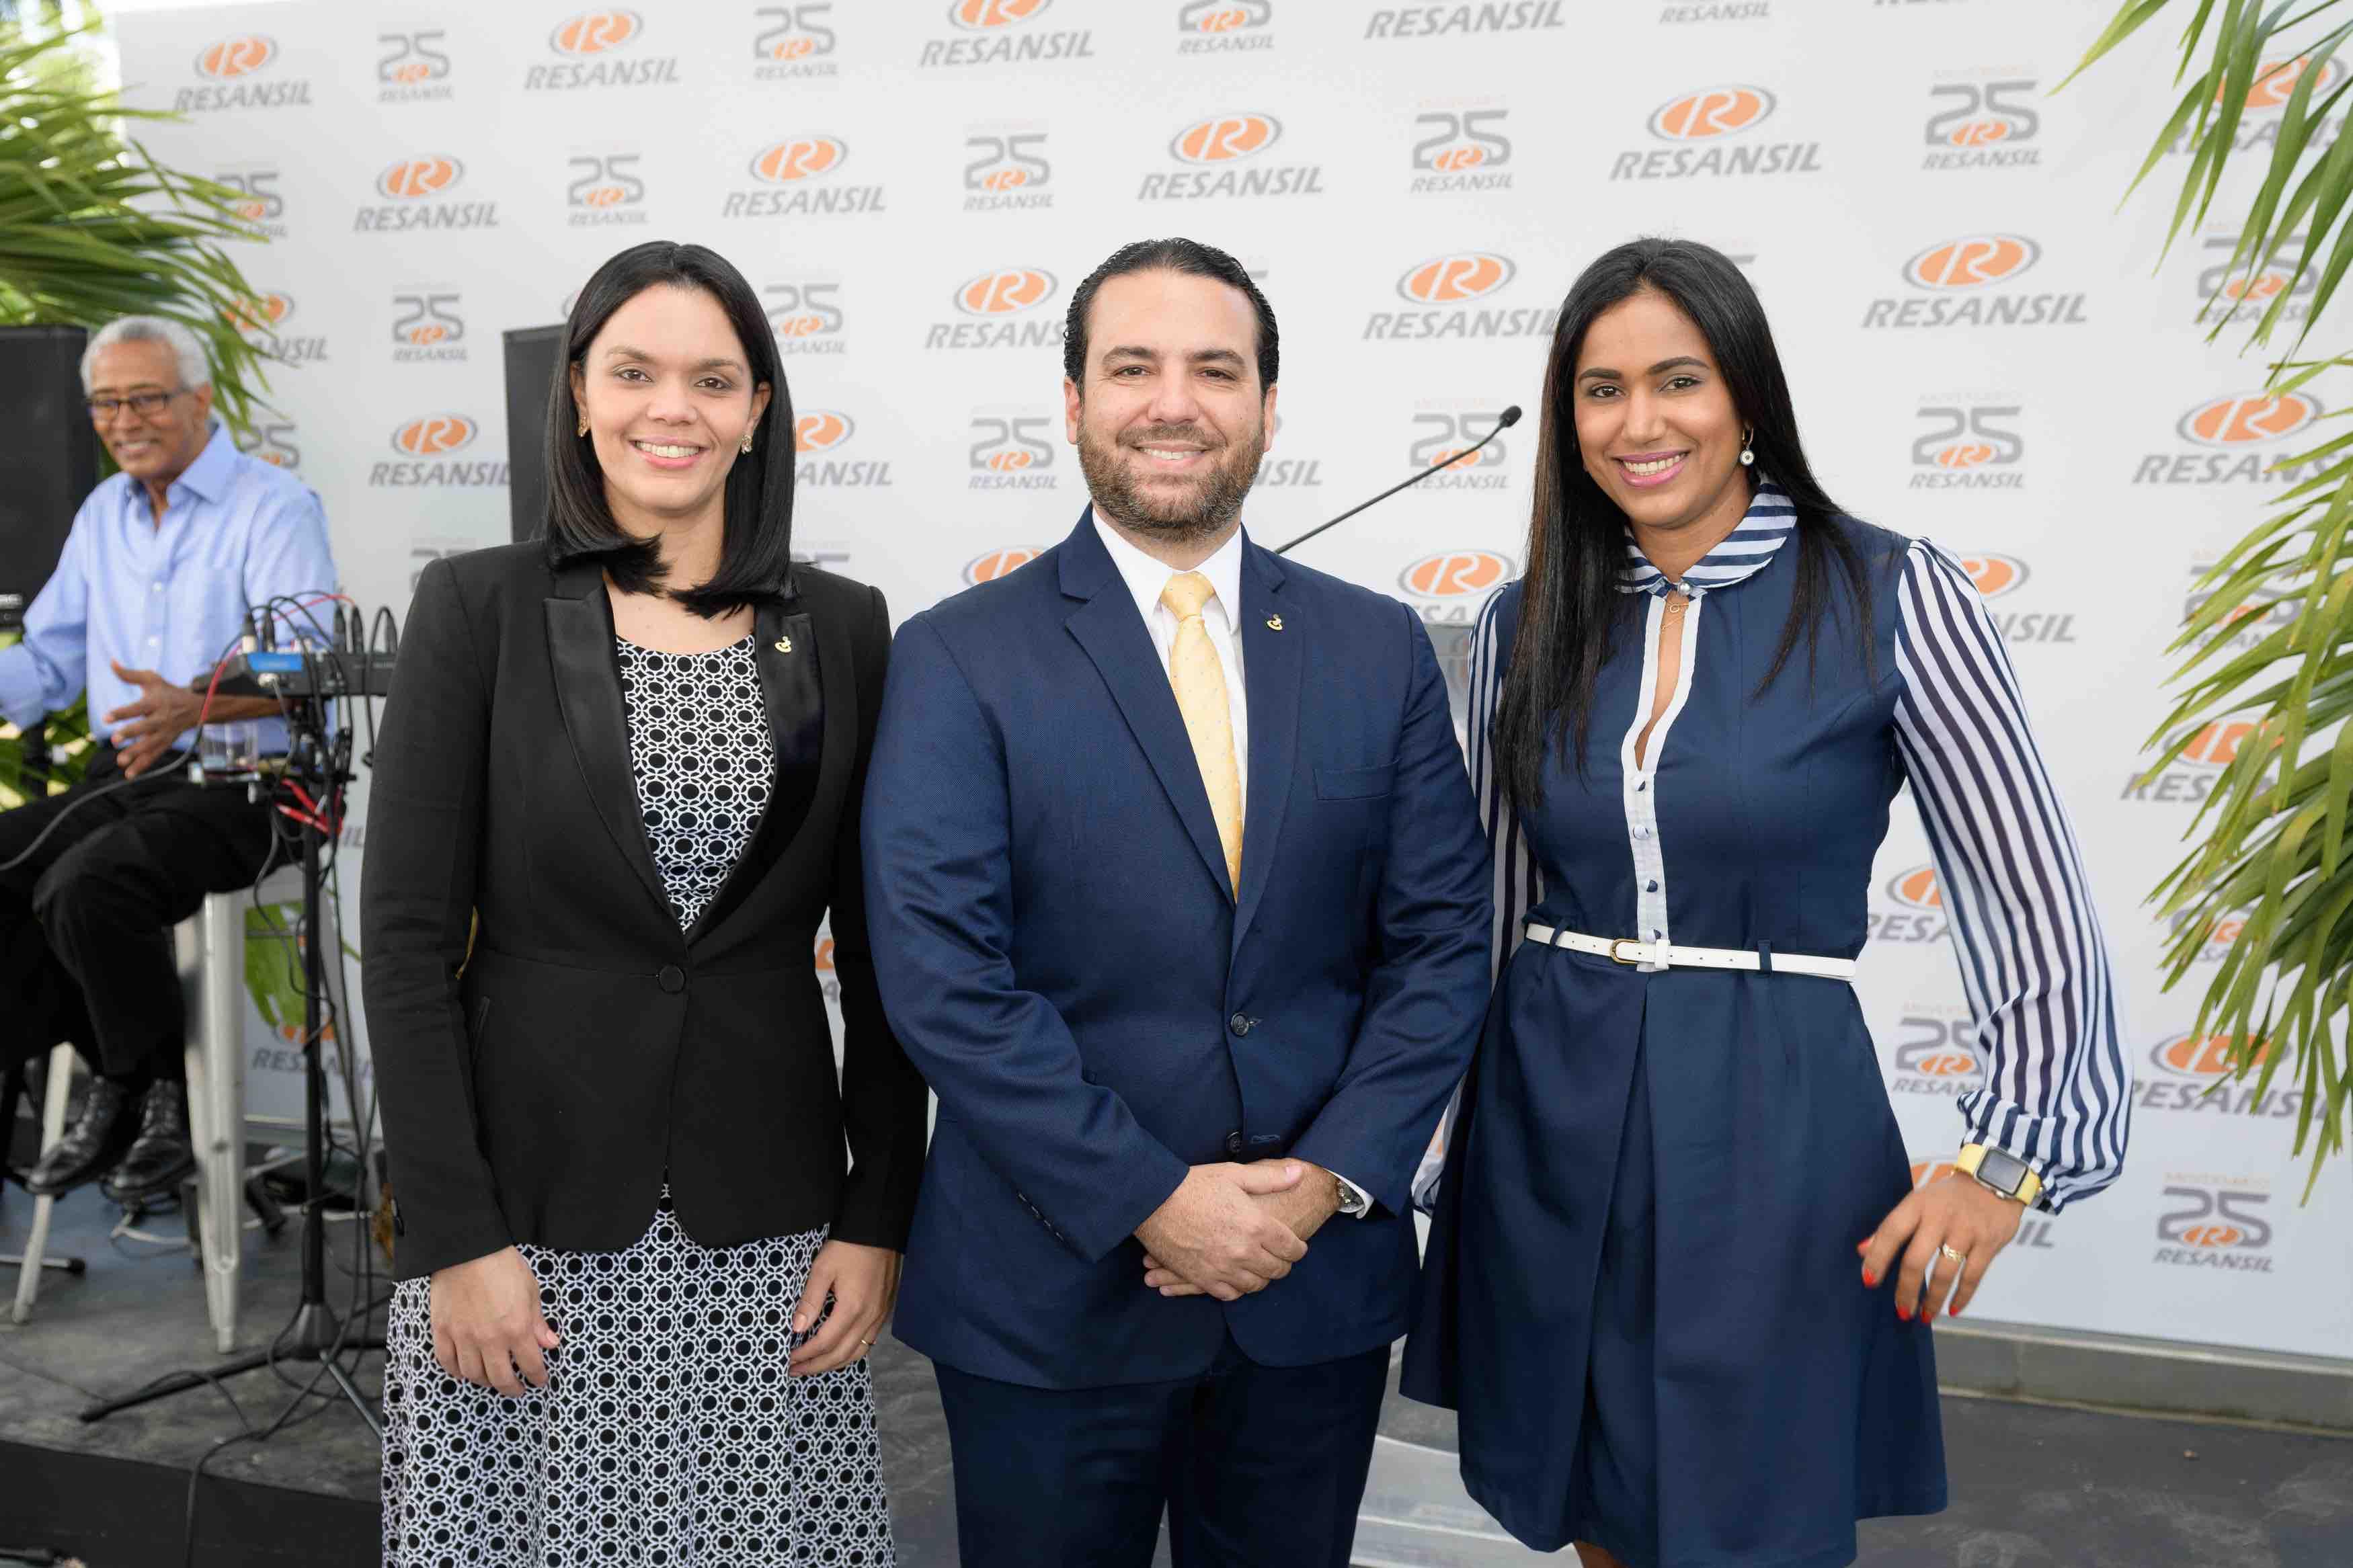 7. Belen Cruz, Javier Abbott & Berenice Canela